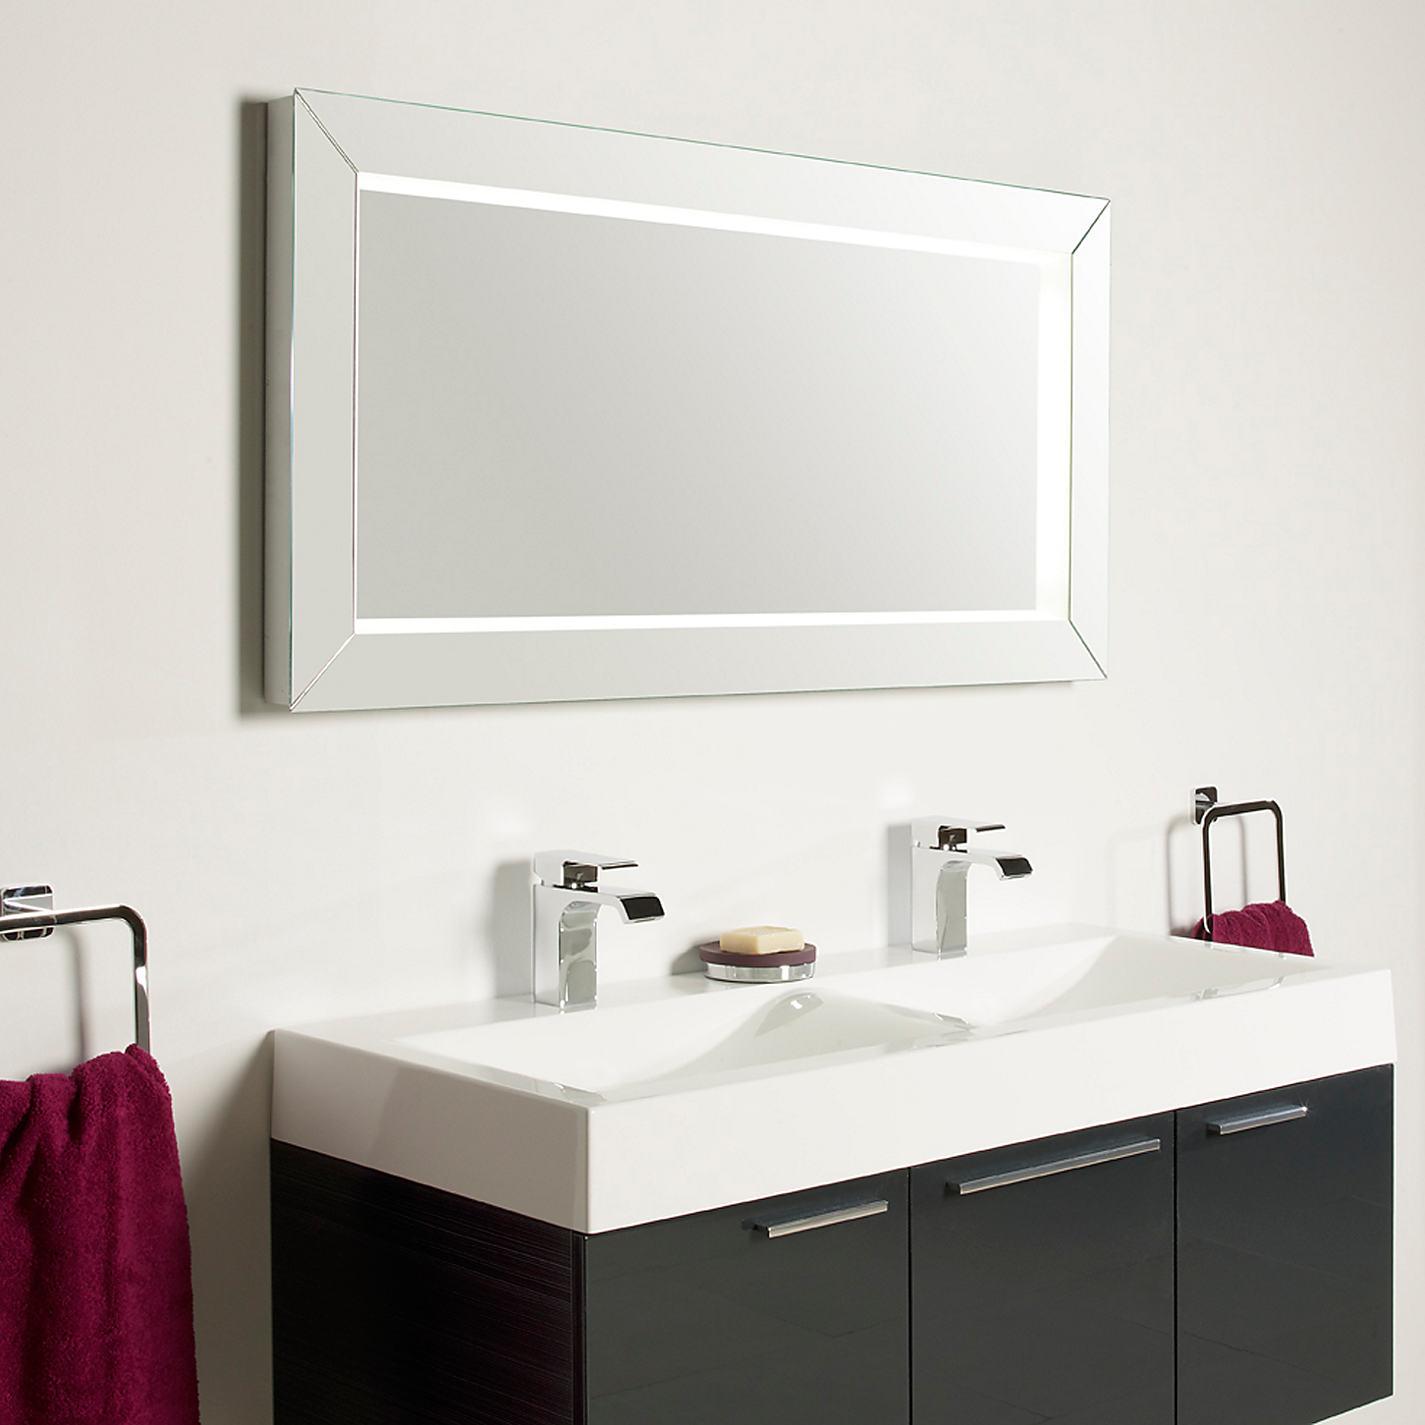 Bathroom Mirrors Roper Rhodes Affinity Illuminated Mirror Online At Johnlewiscom S